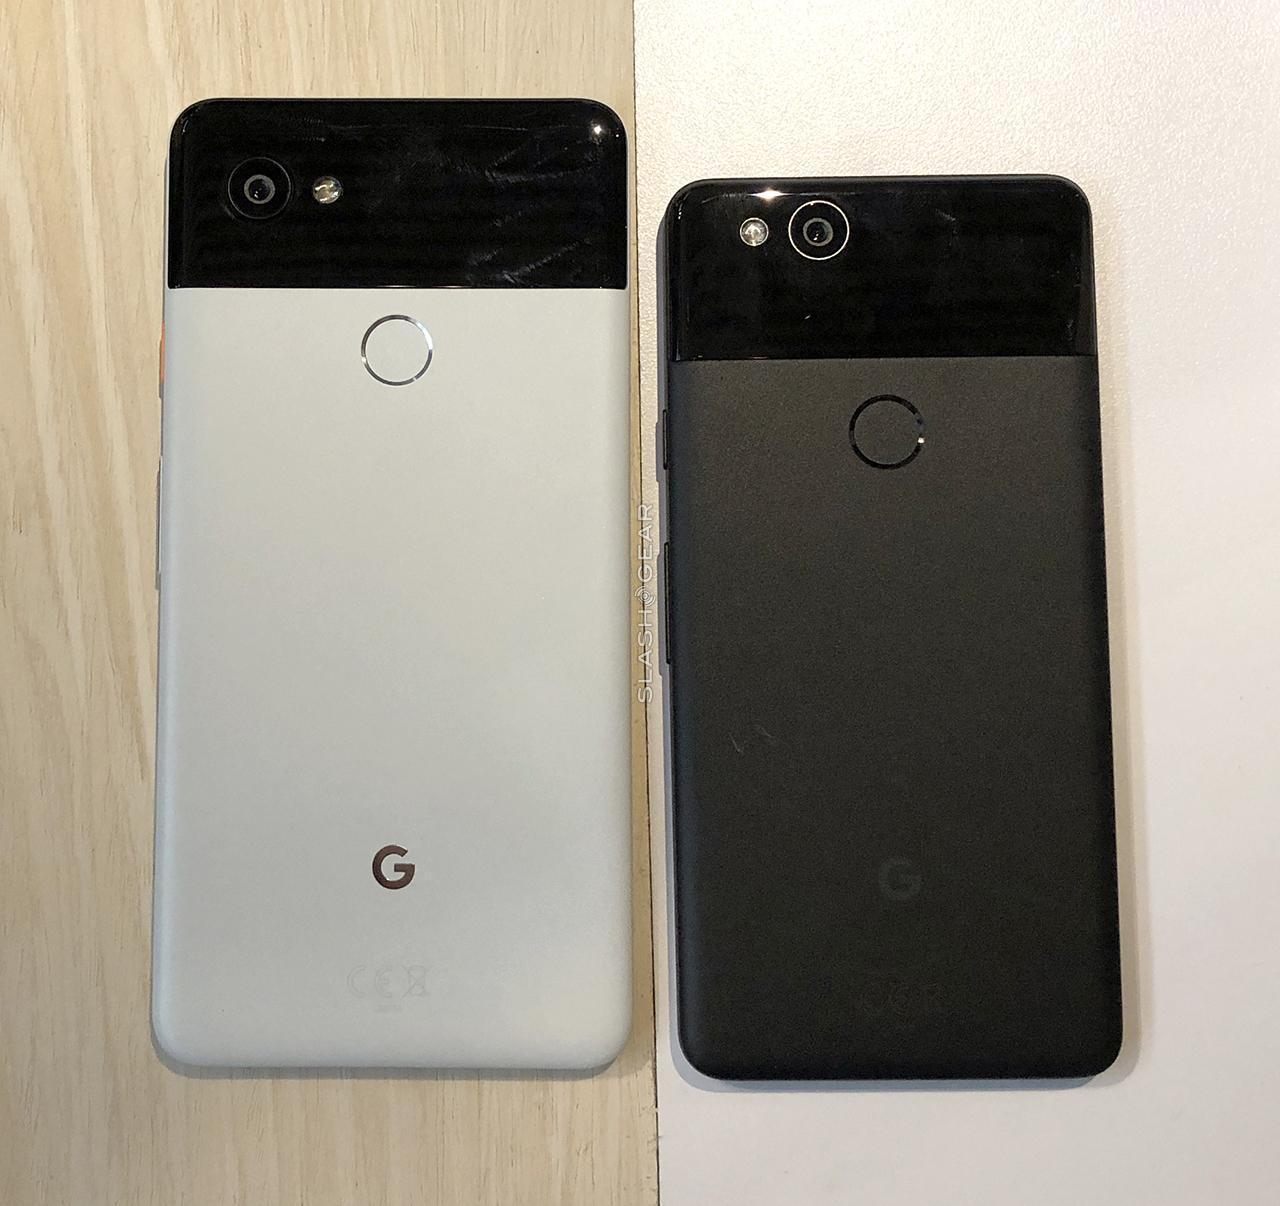 pixel 2 xl used